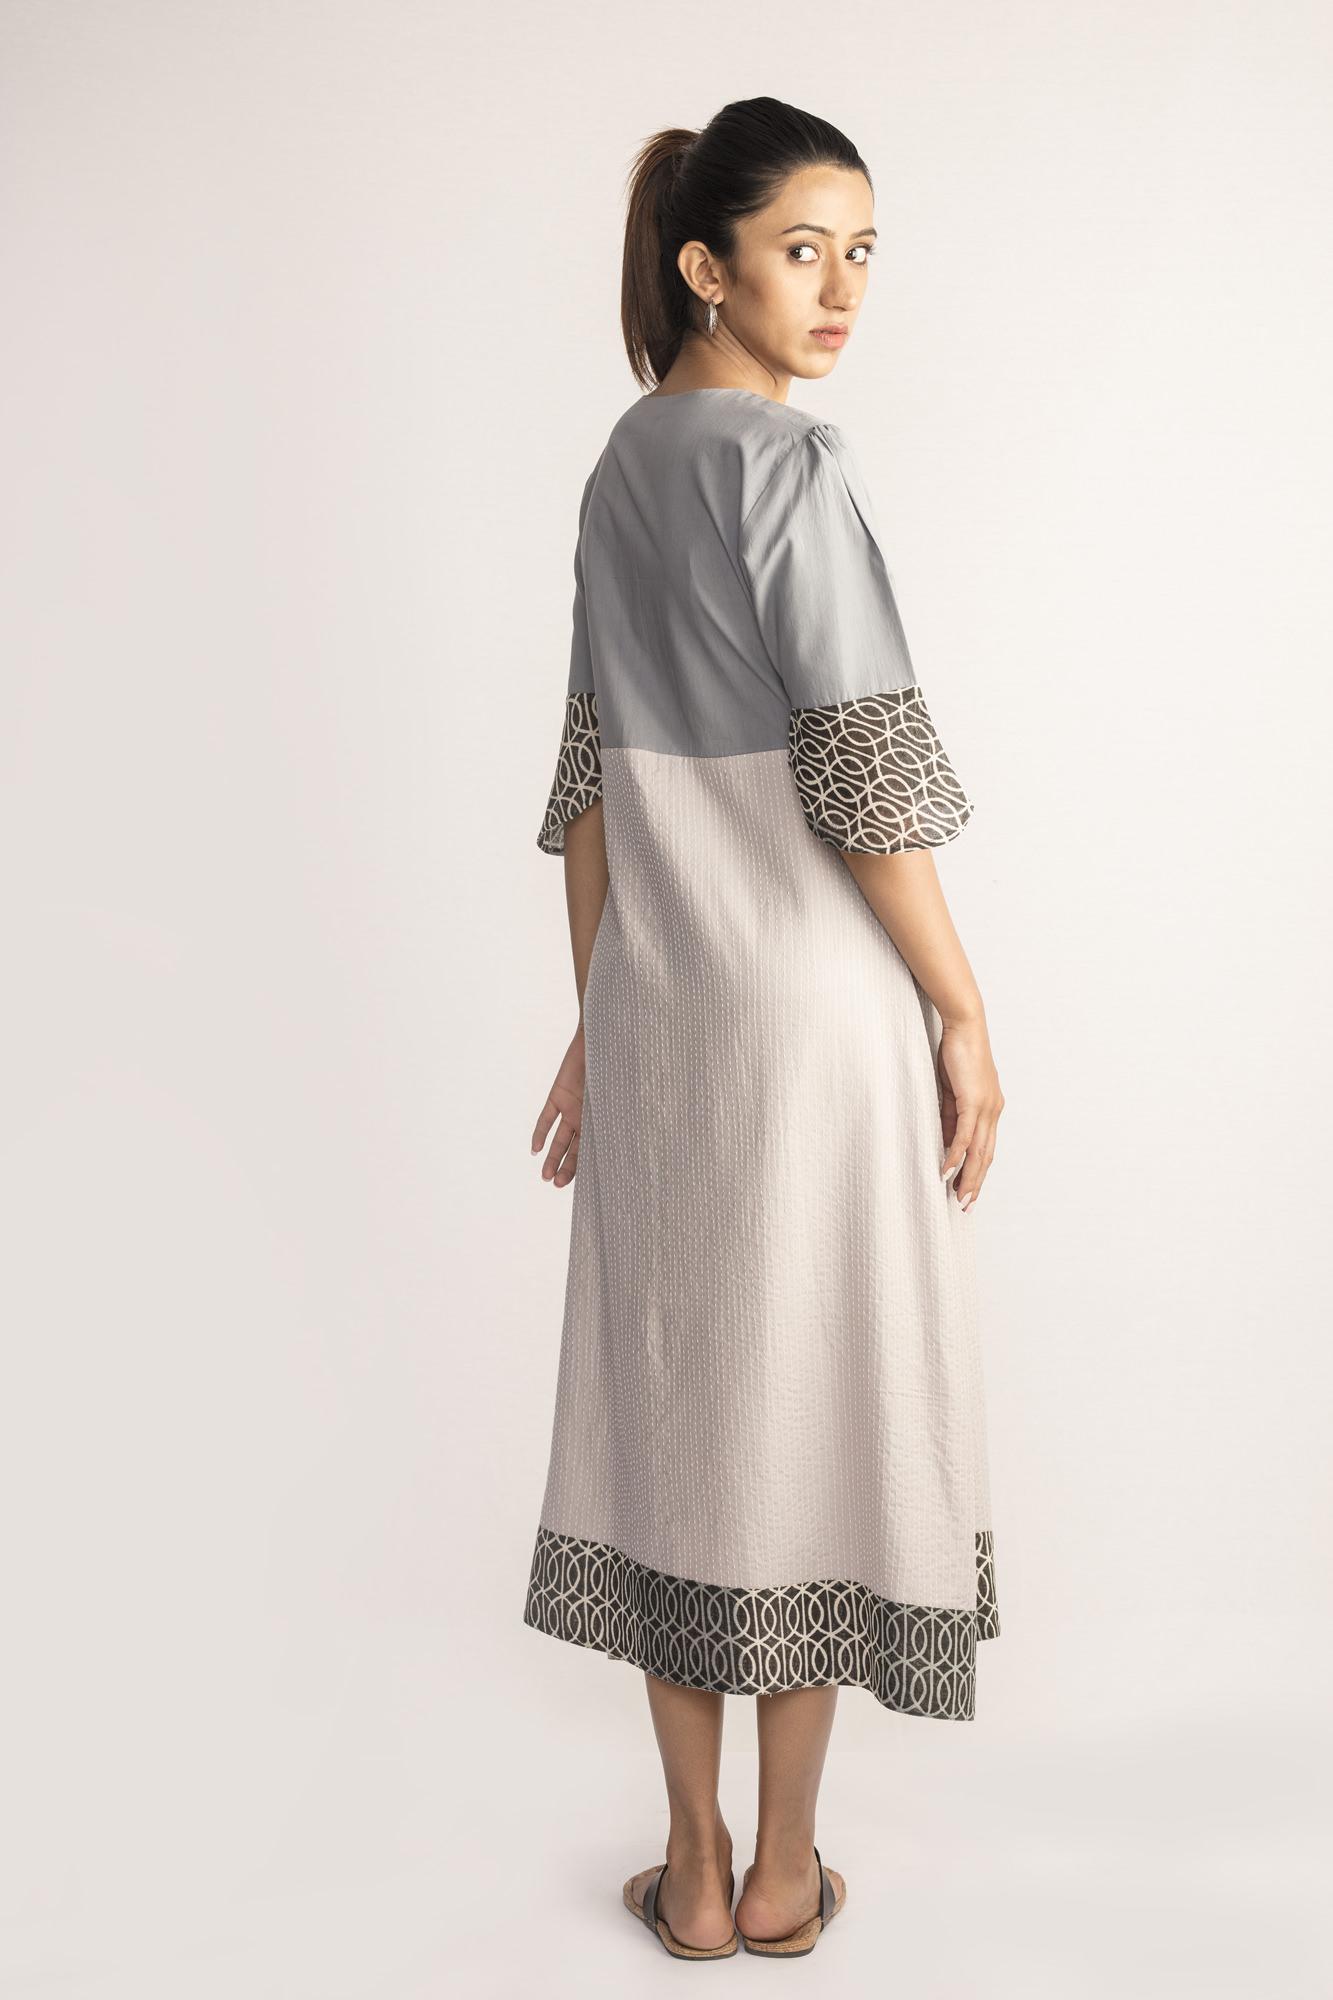 Grey Ikat Midi Dress By TAMASQ